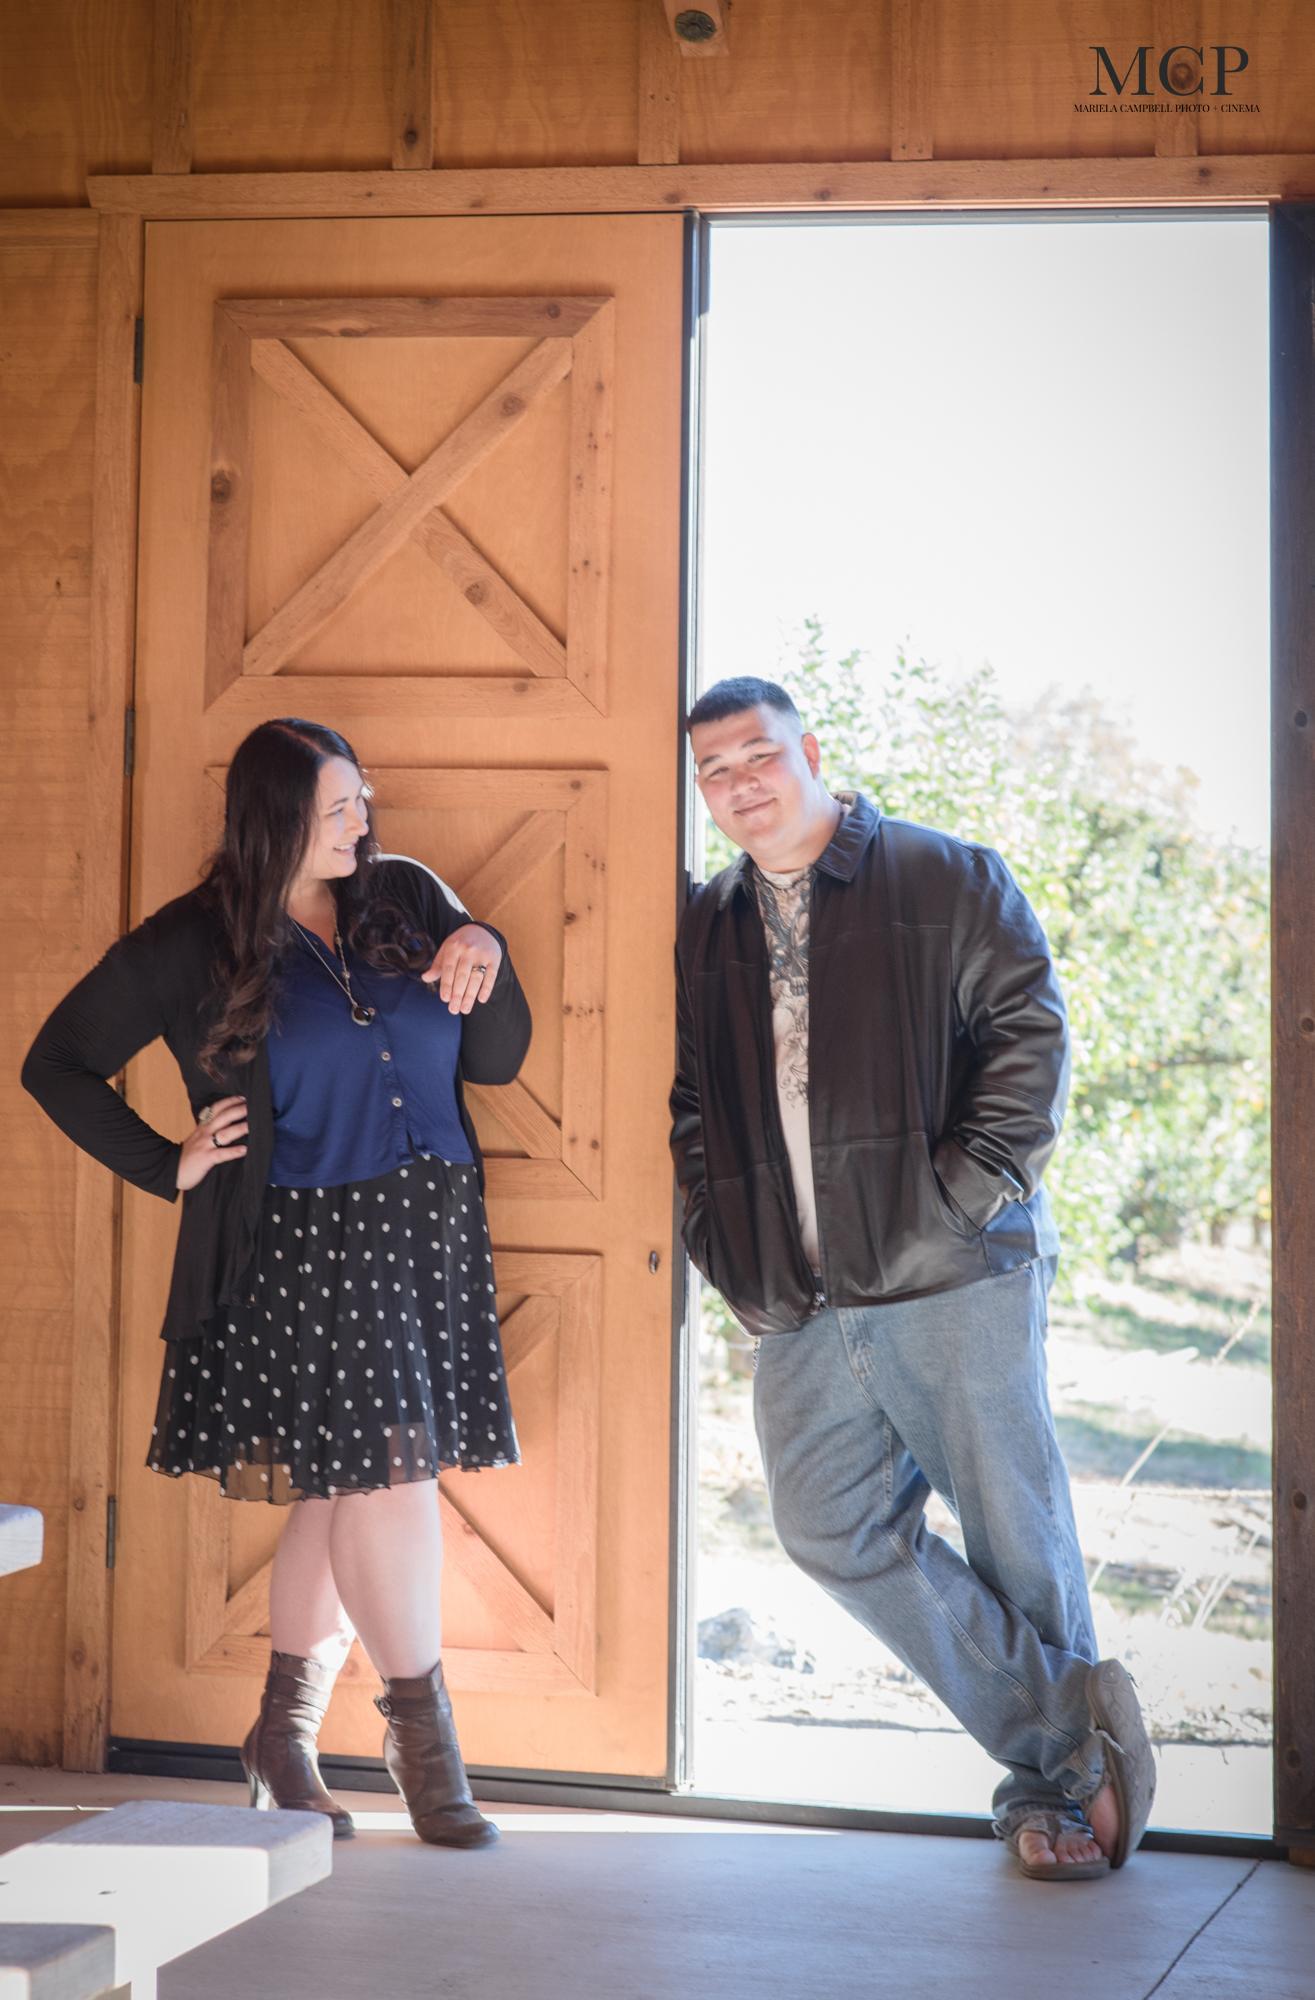 MCP-A&S.Engagement.Oak Glen (7 of 14).jpg